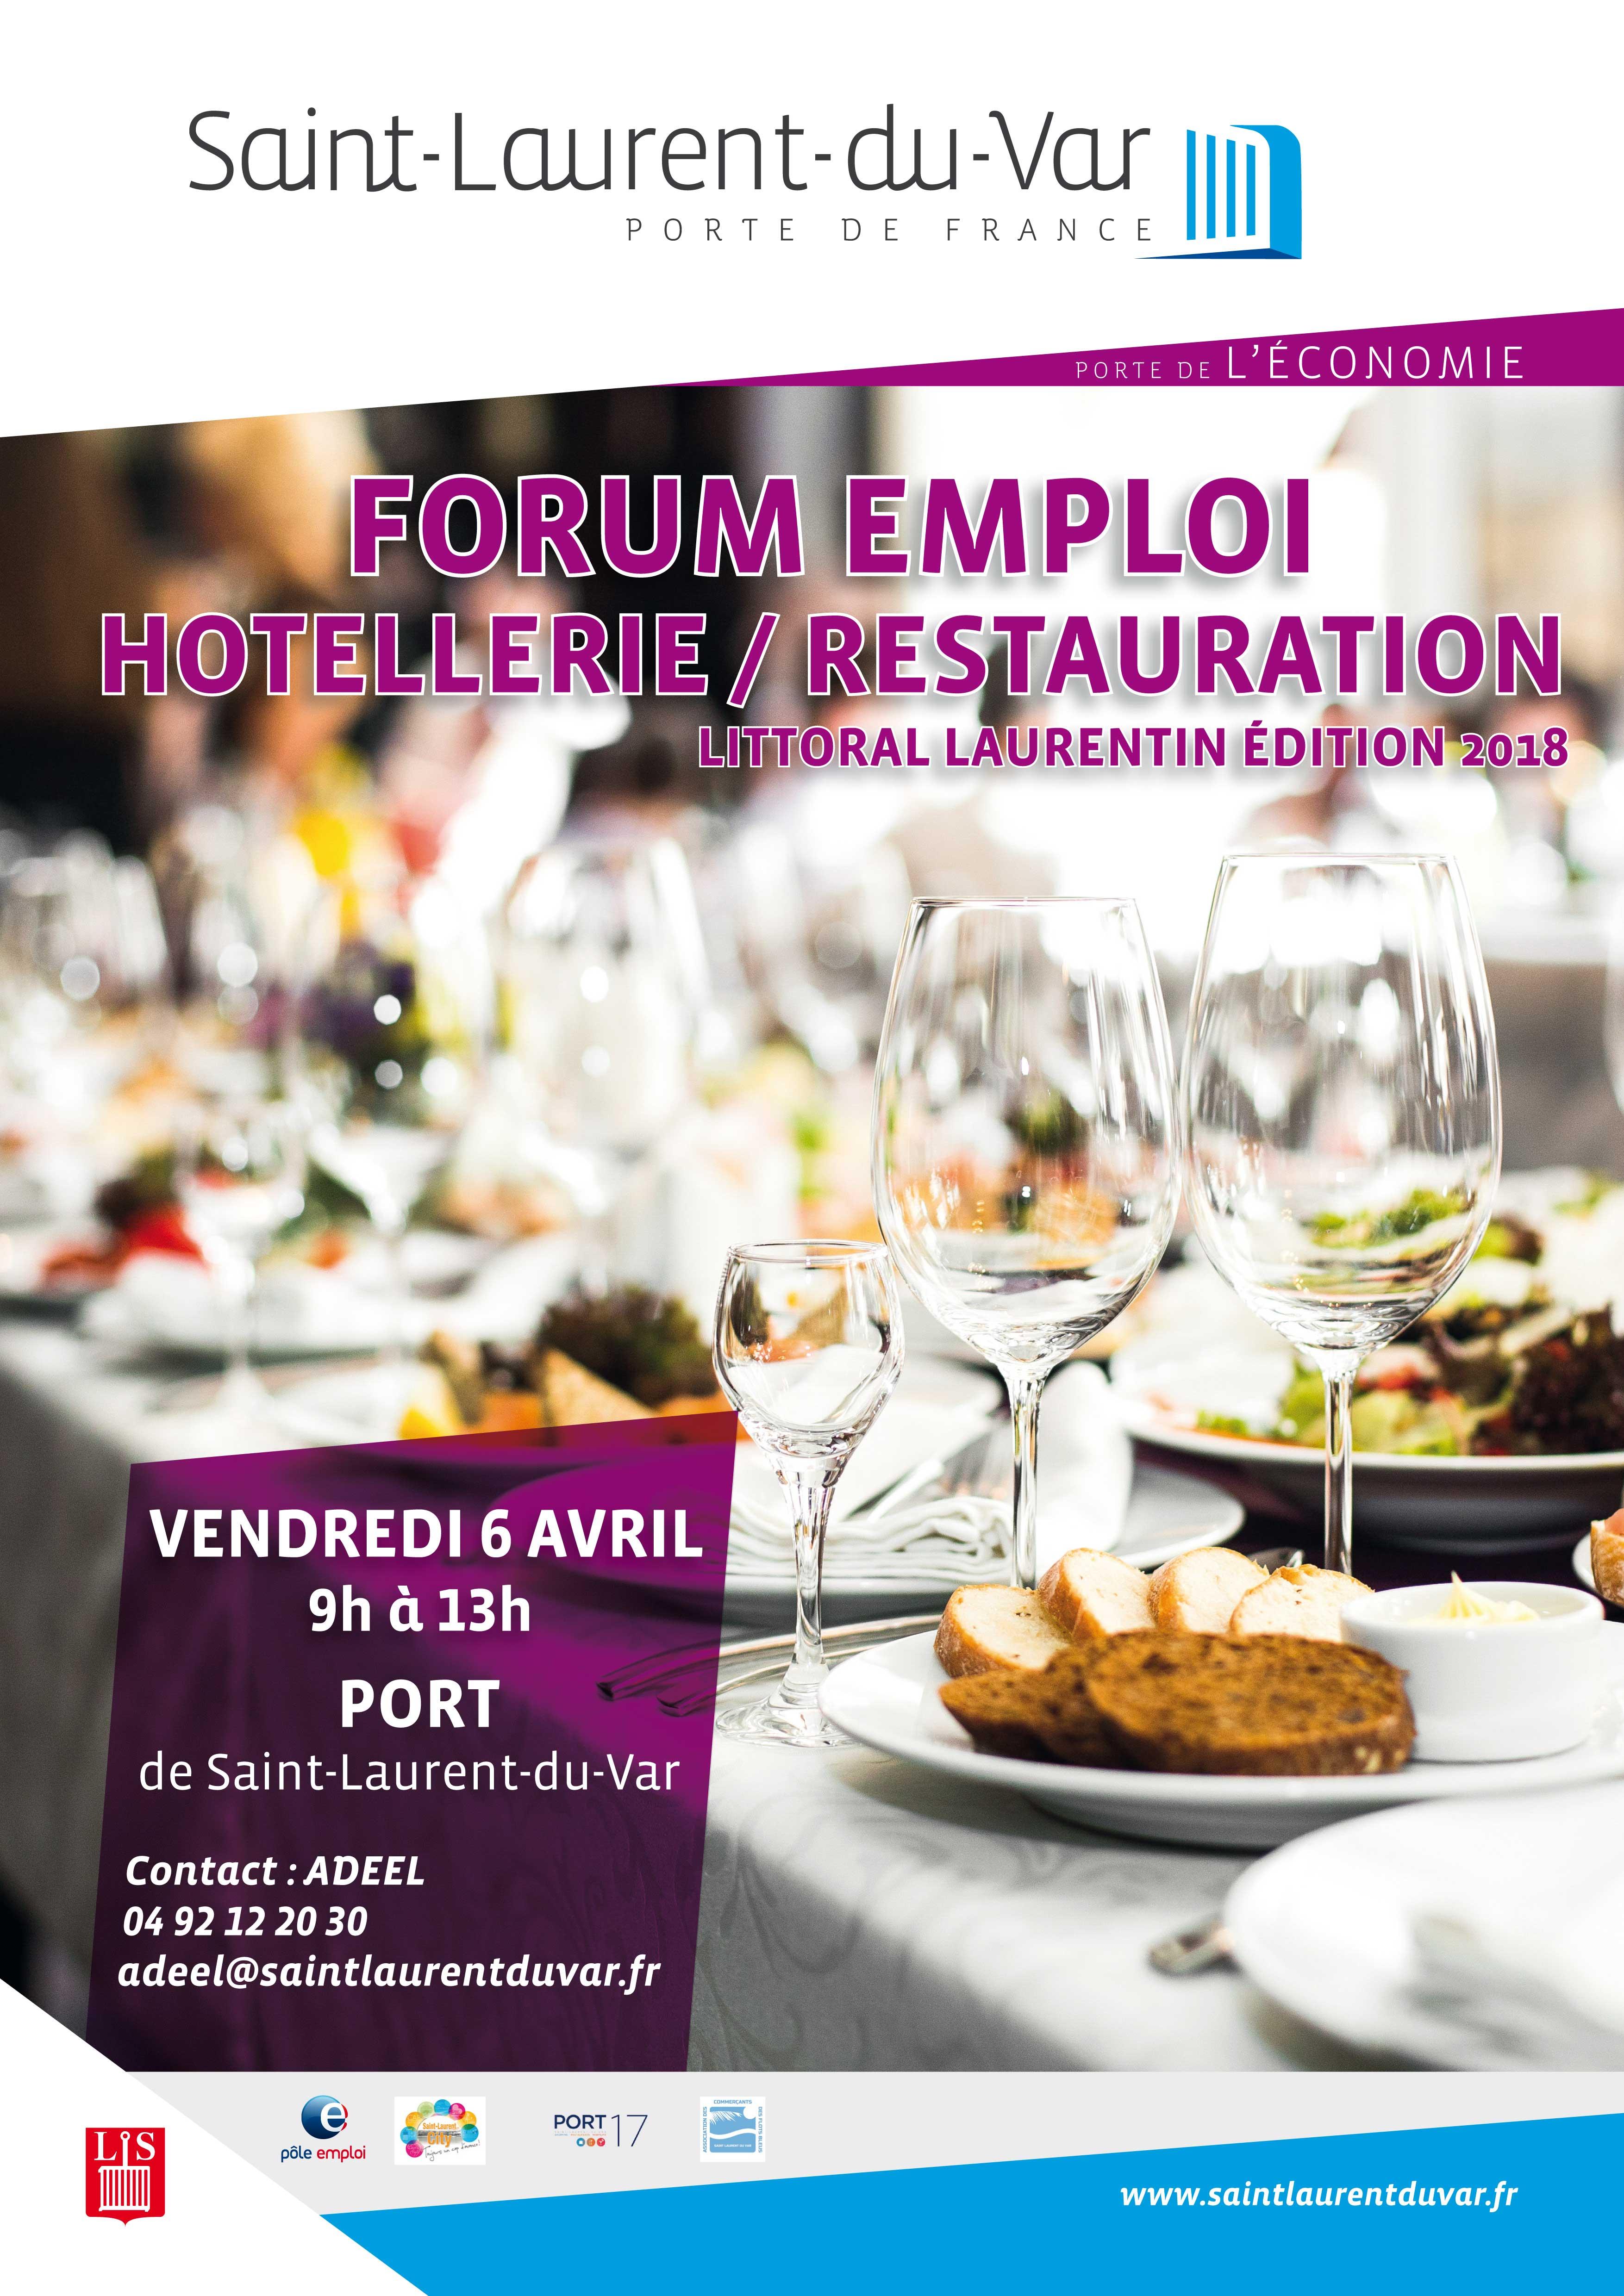 Le forum emploi h tellerie restauration une quinzaine d for Restauration emploi